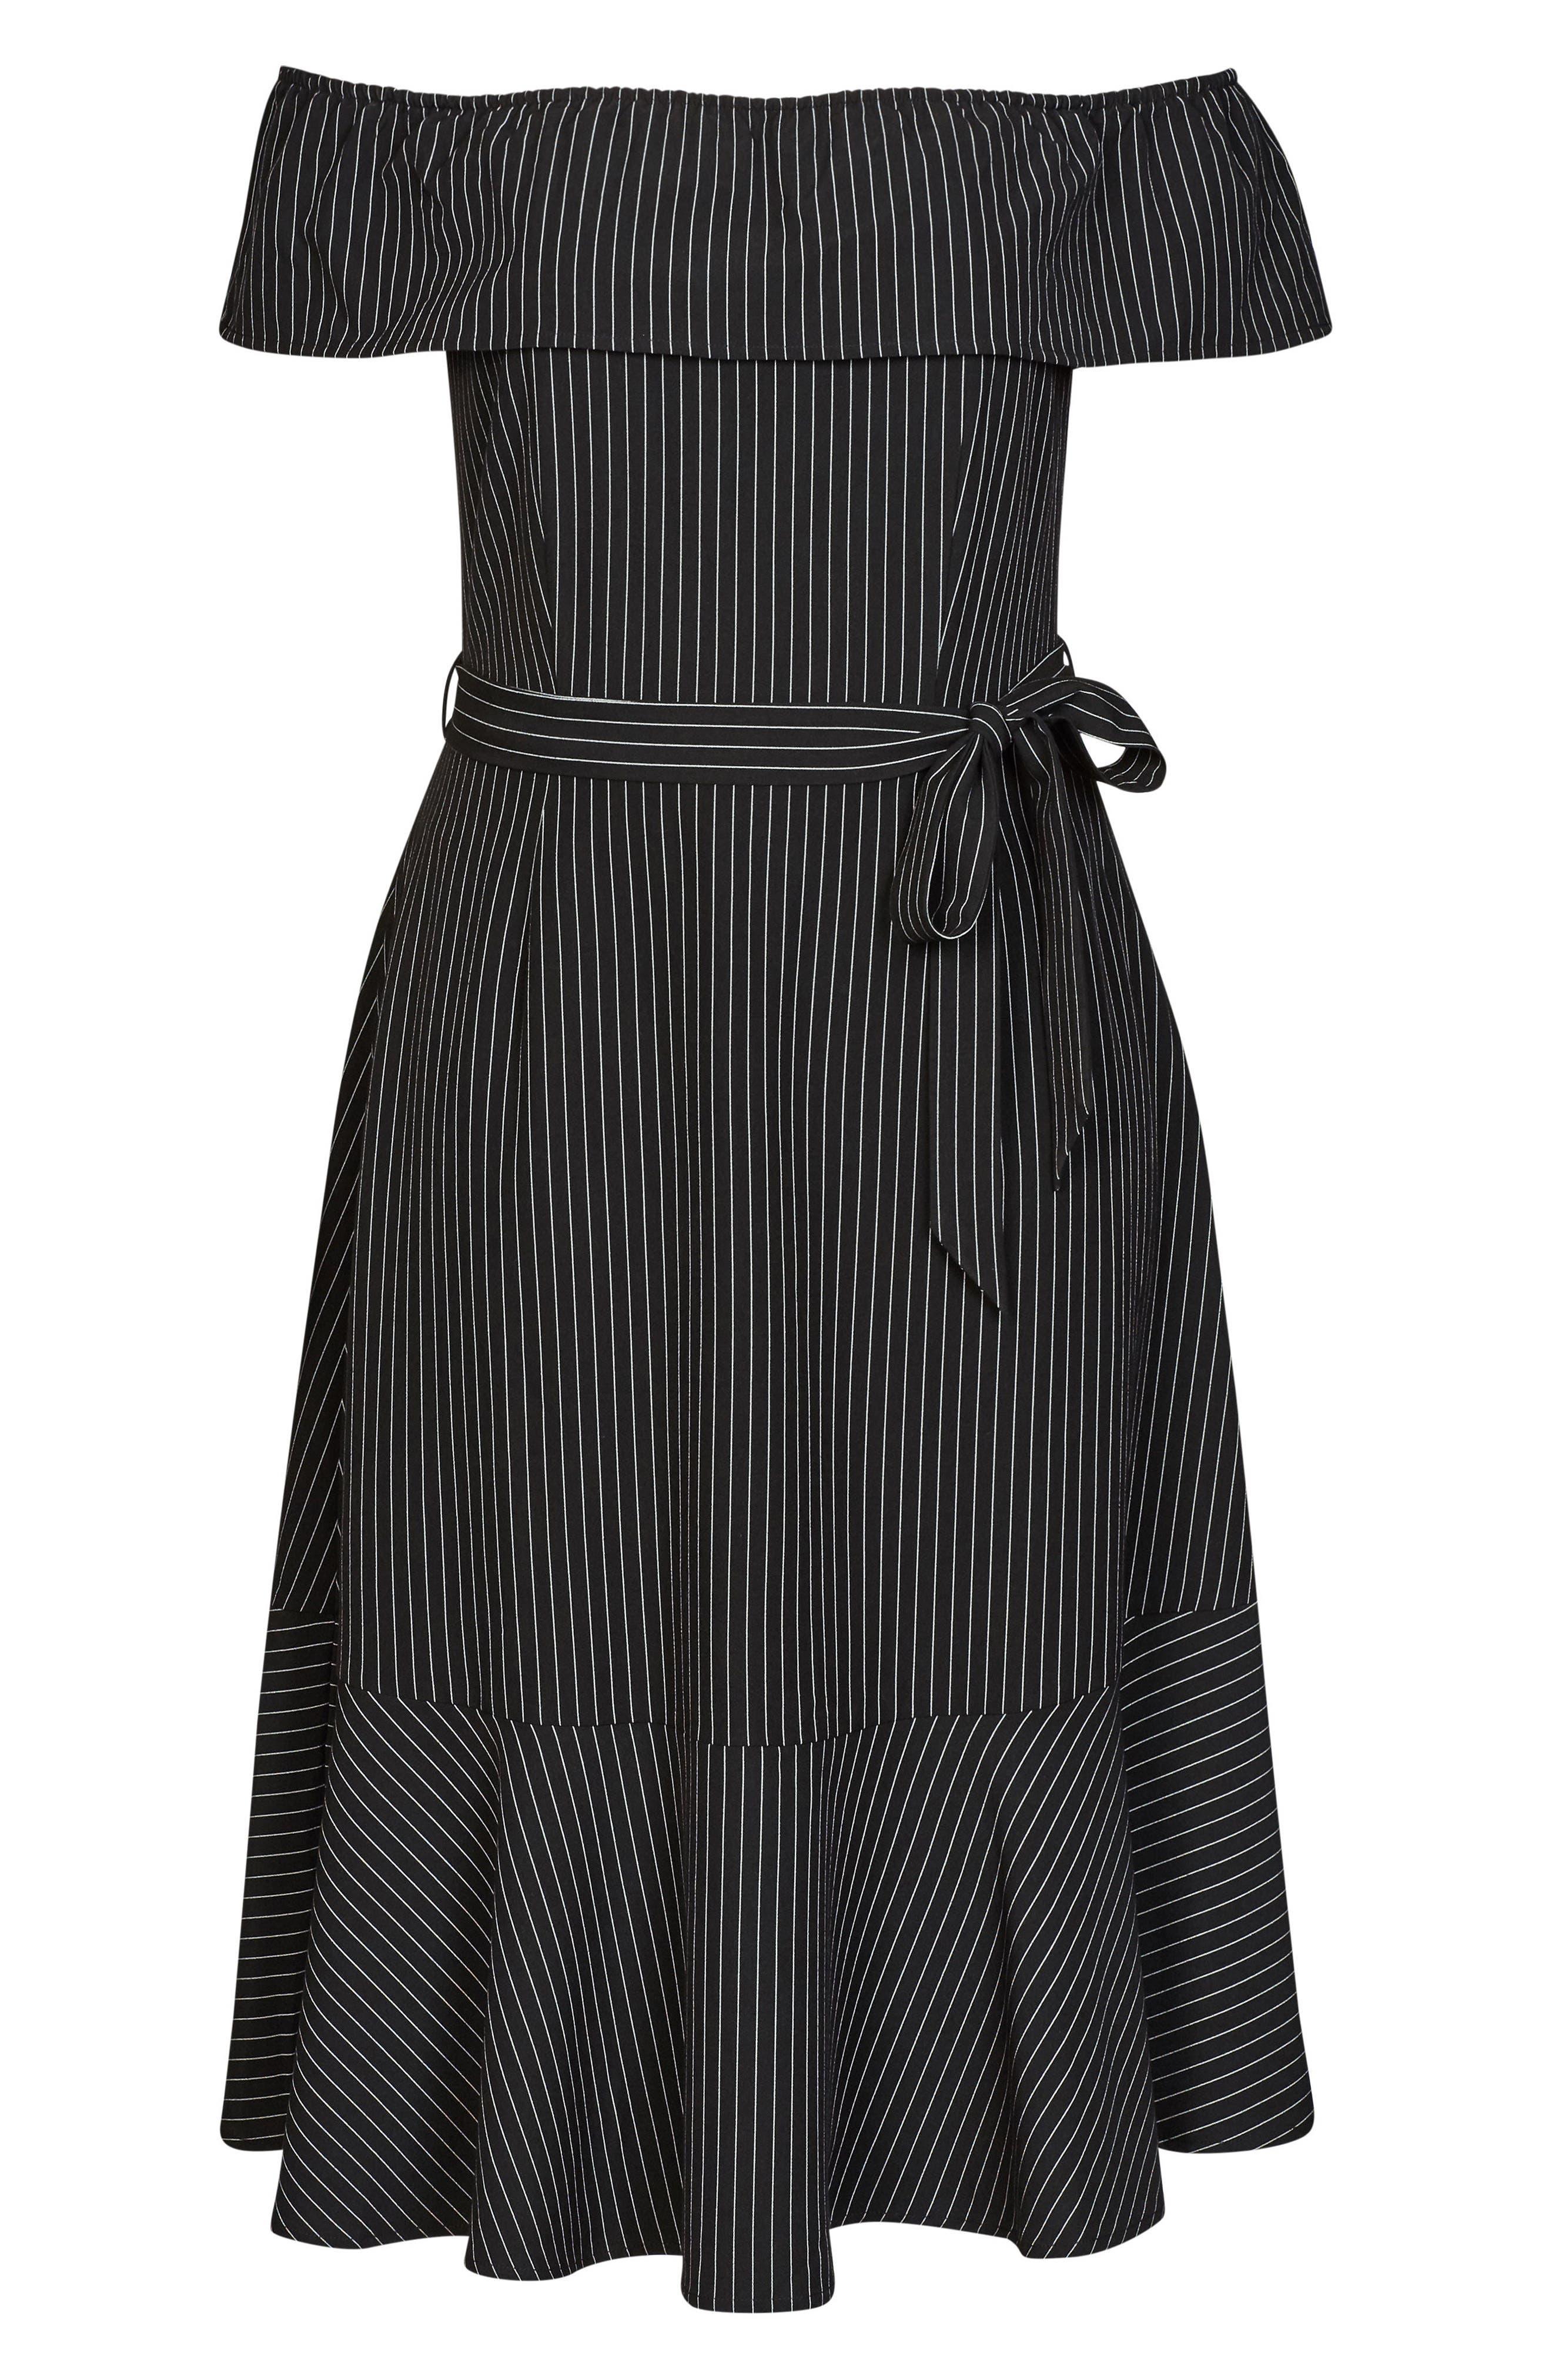 CITY CHIC,                             Midi Madame Stripe Off the Shoulder Dress,                             Alternate thumbnail 3, color,                             BLACK